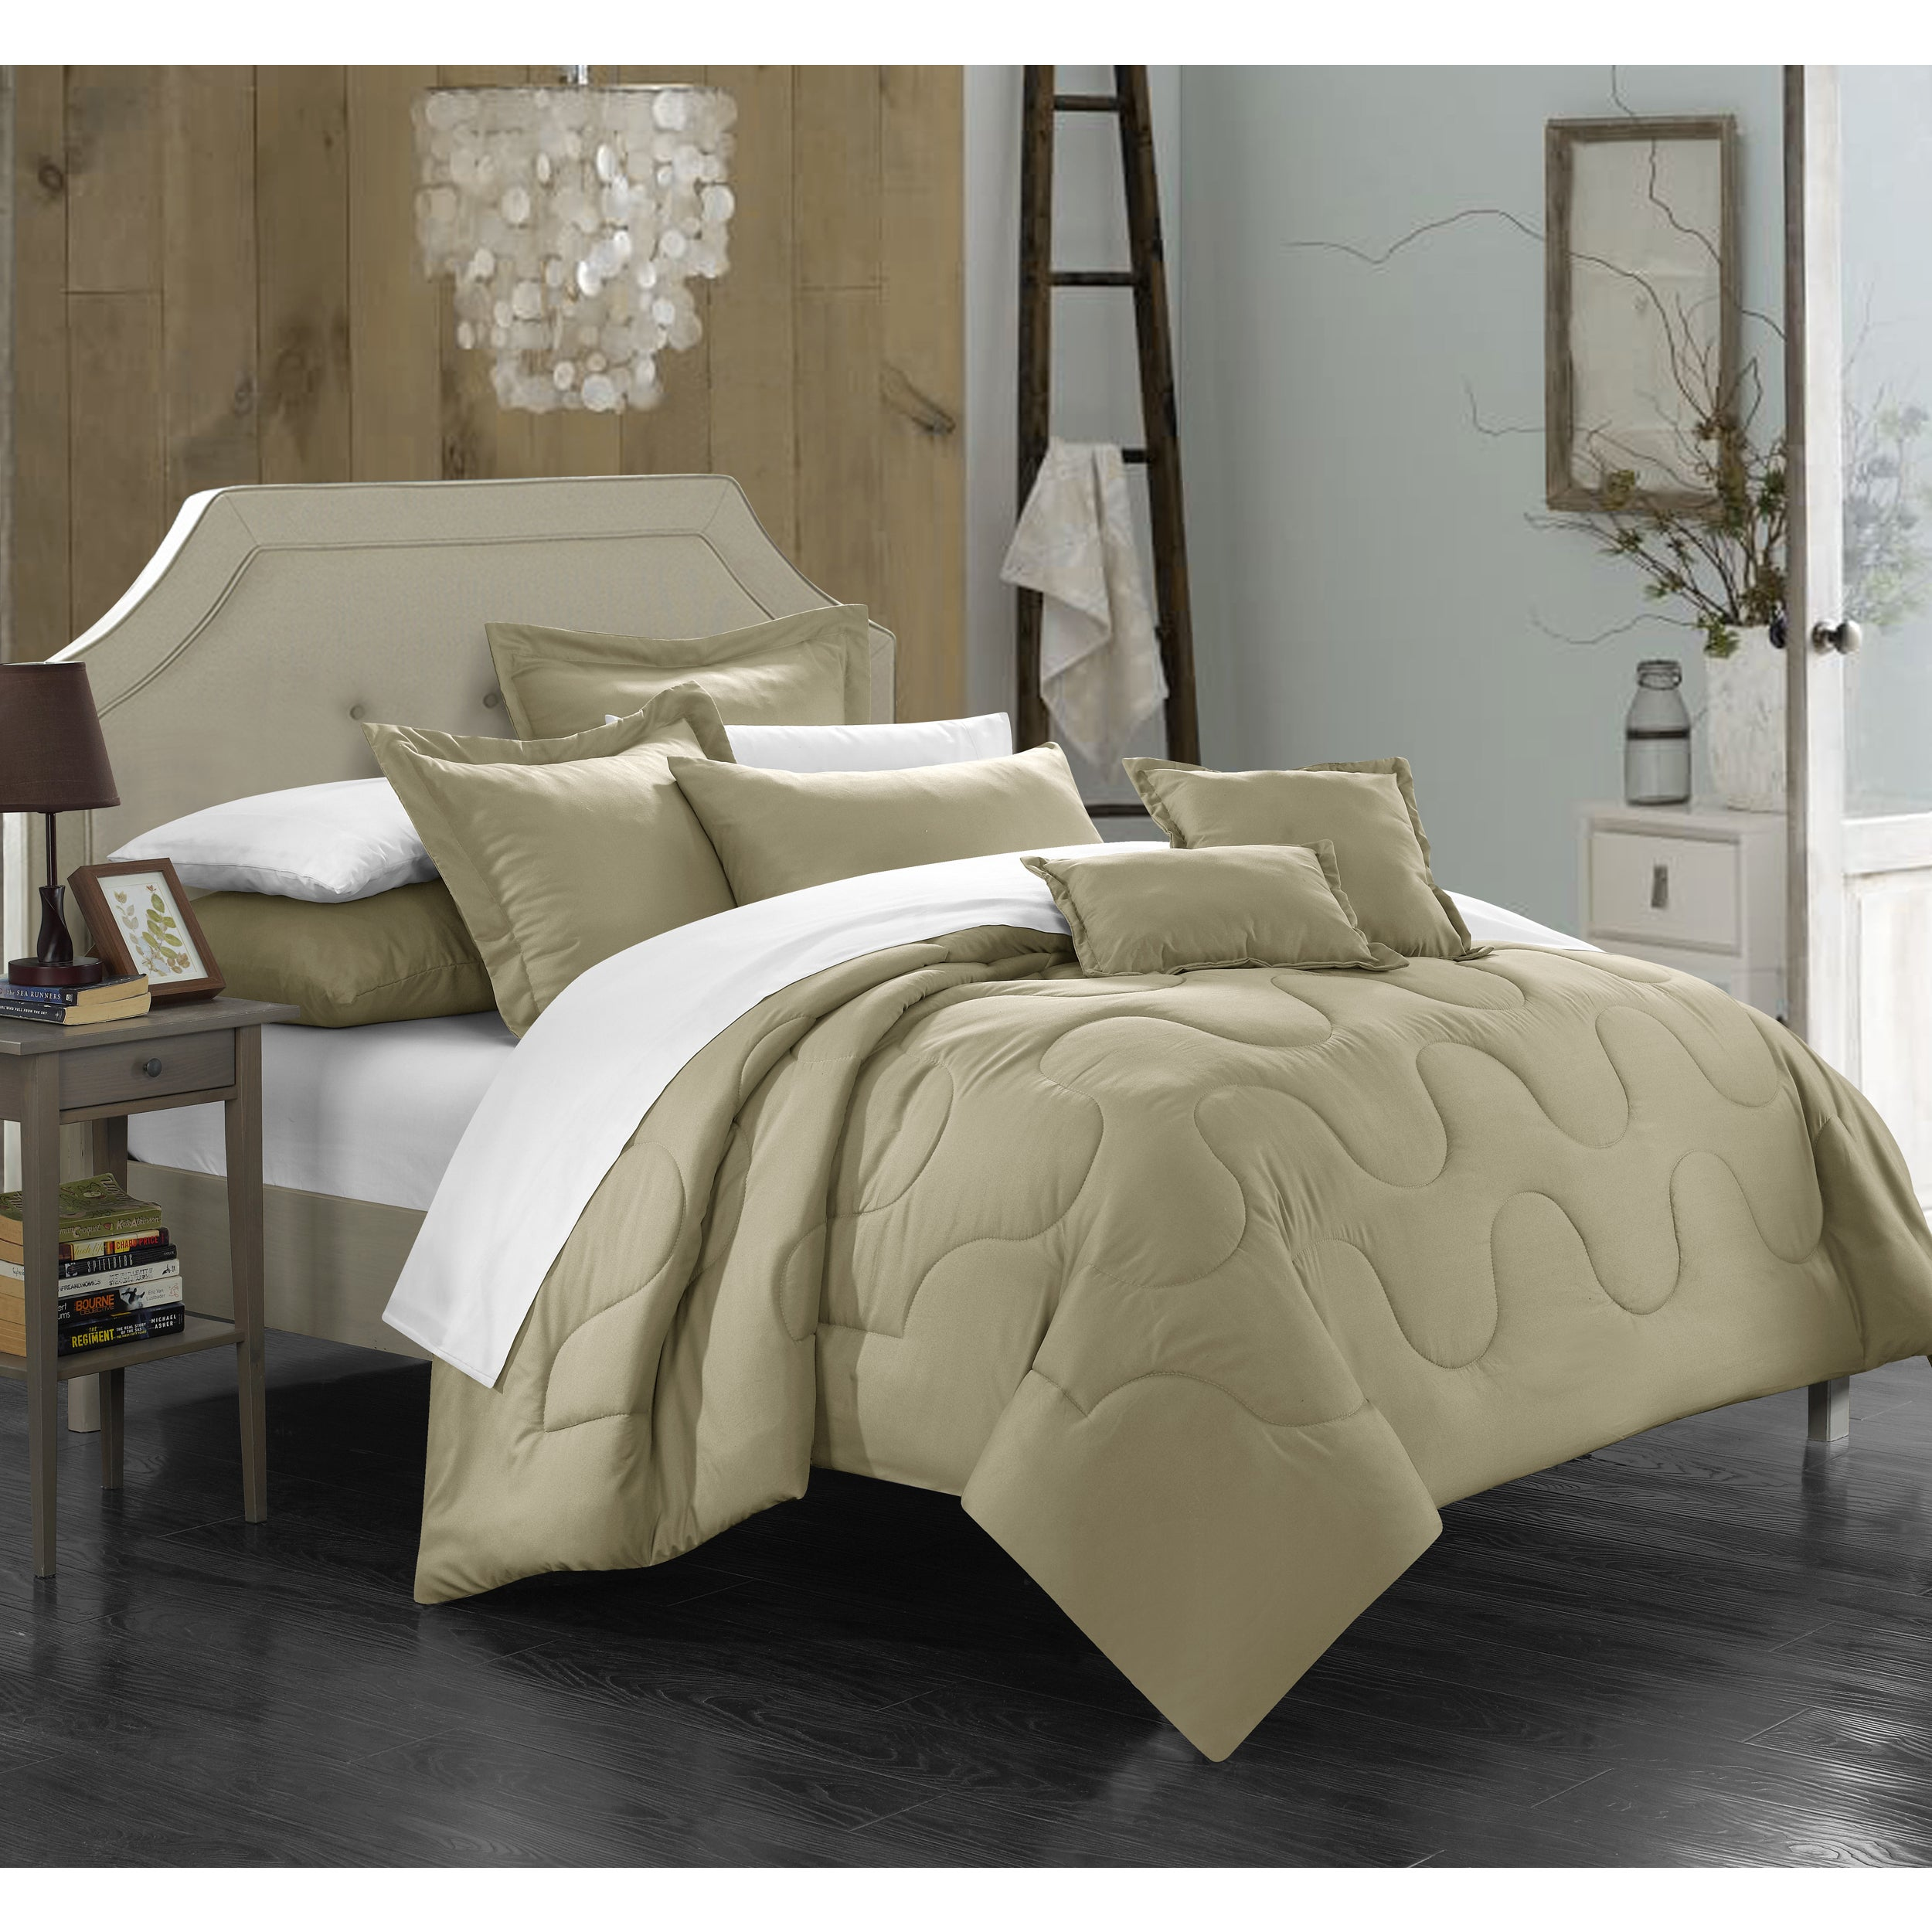 Chic Home Direllei Taupe Down Alternative 7-piece Comforter Set